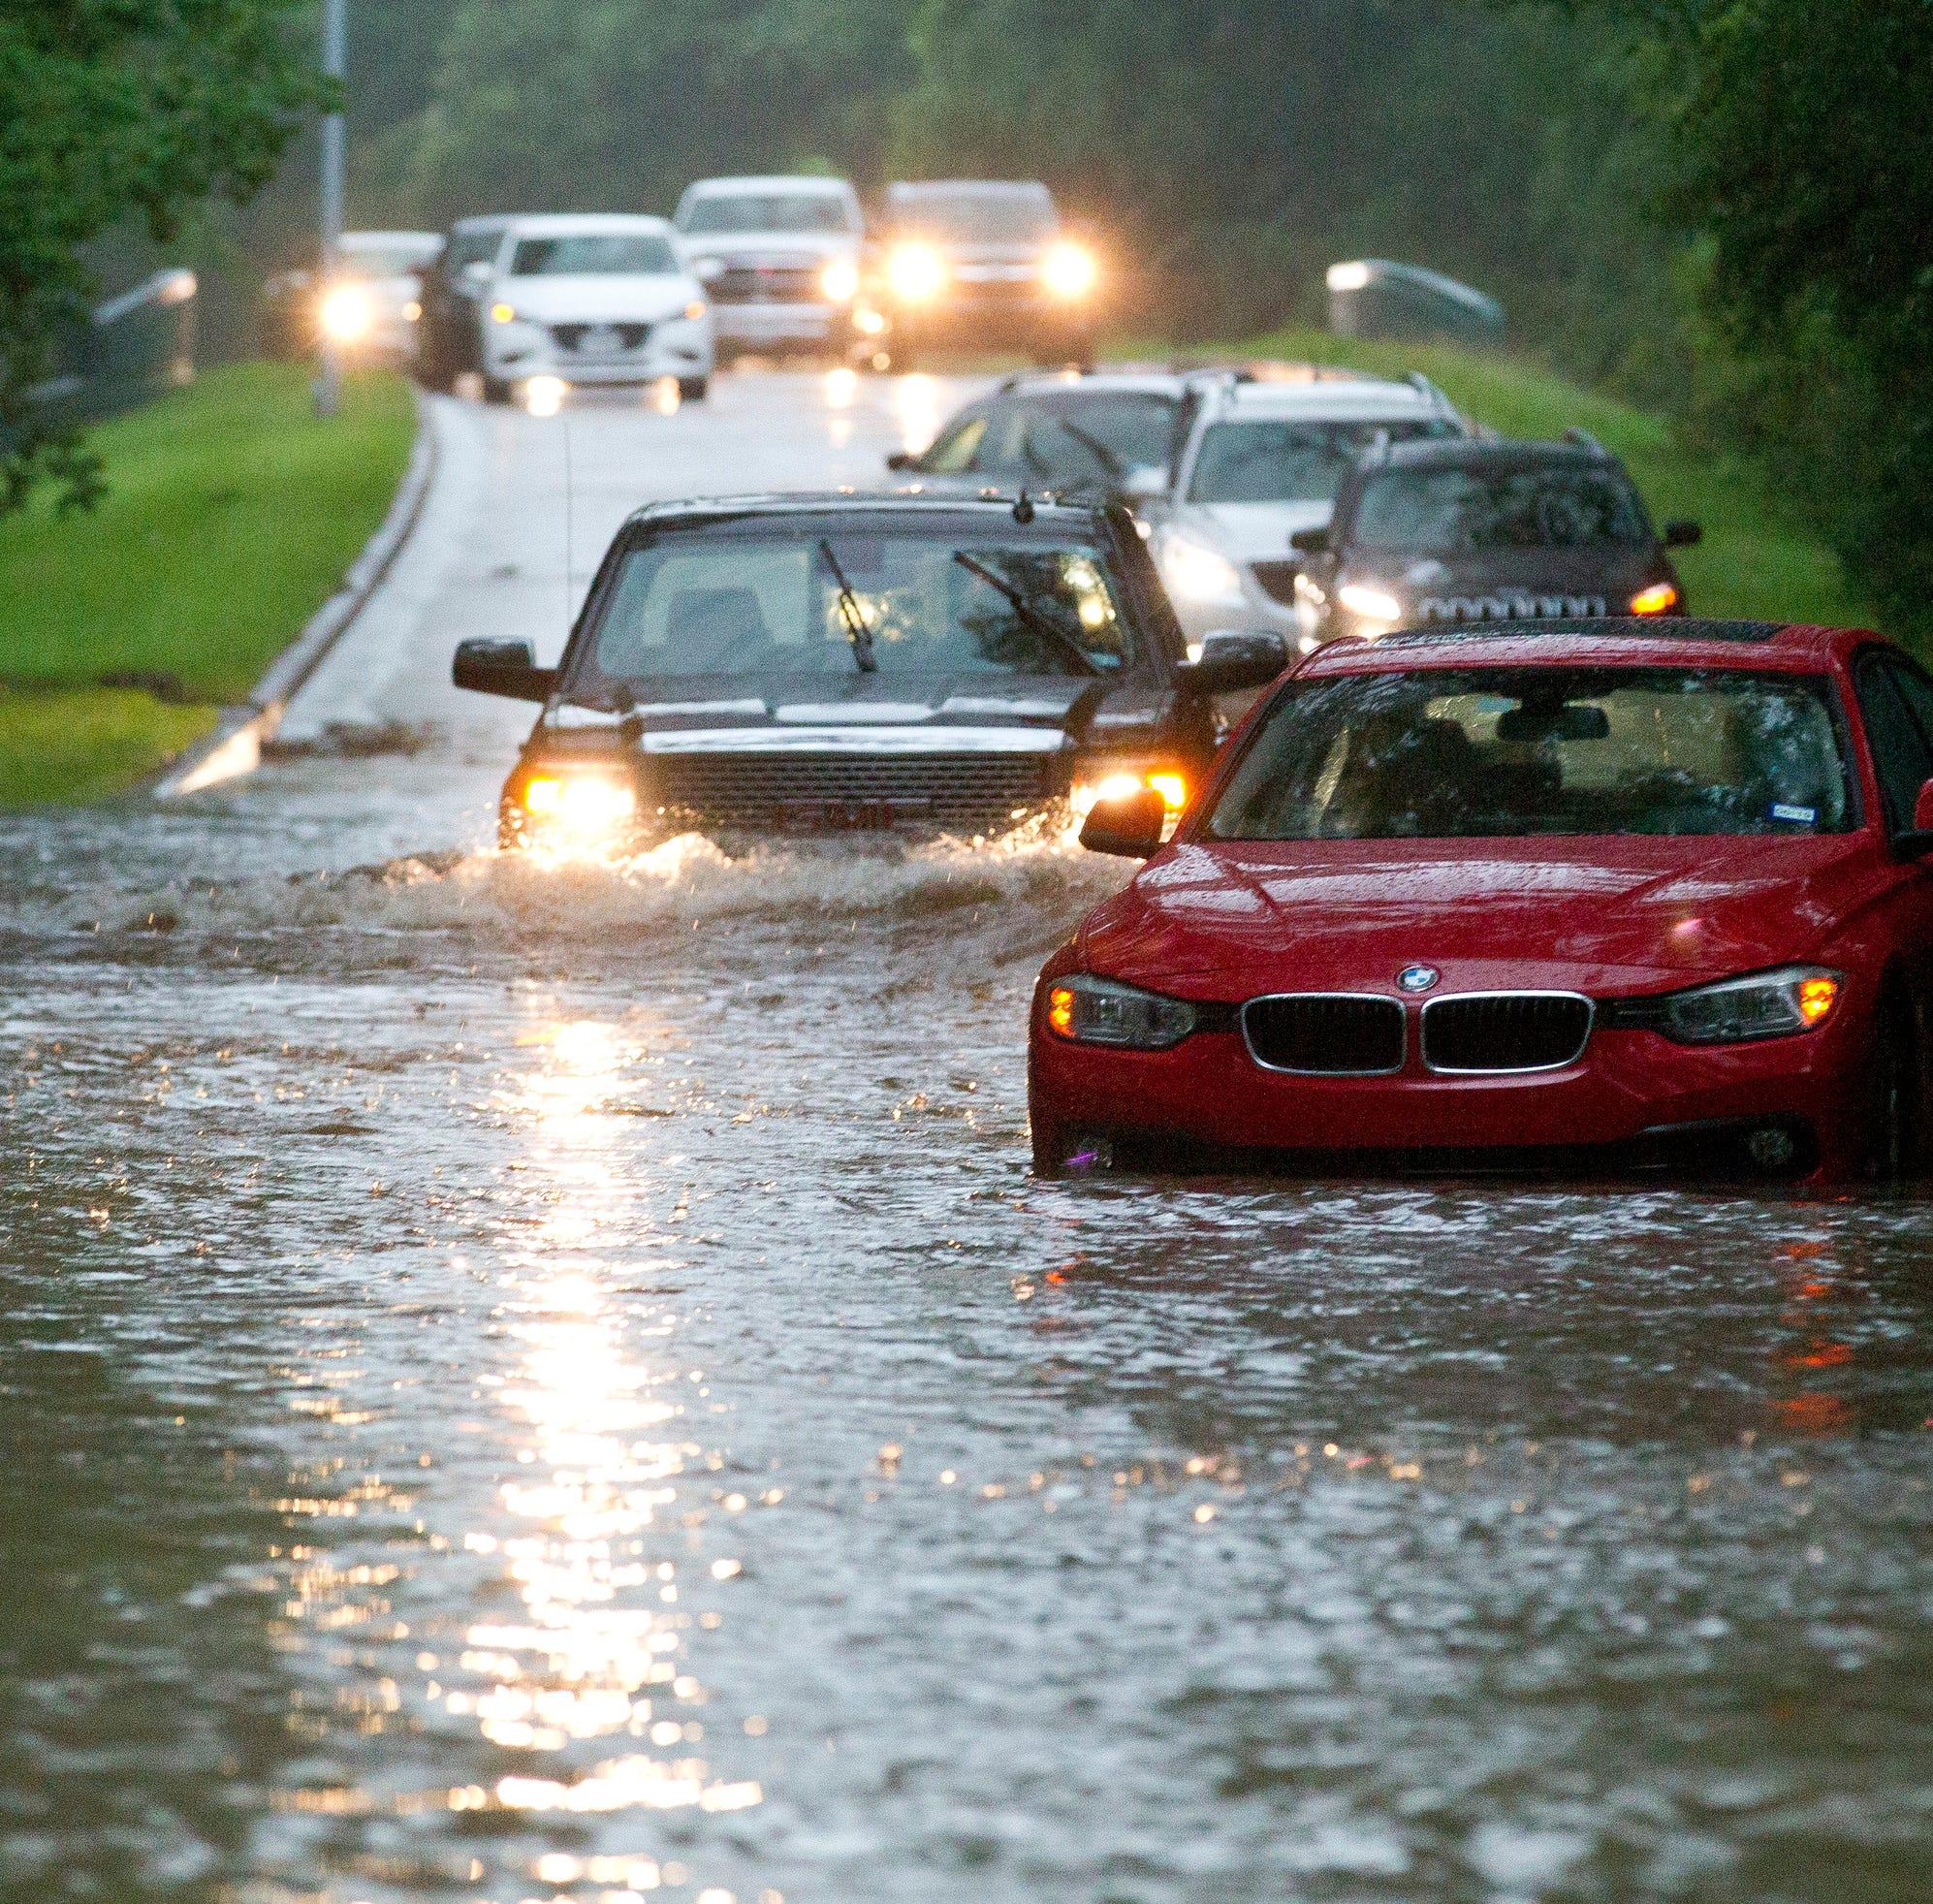 May mayhem: Tornadoes, storms, floods, snow wreak weather havoc across US